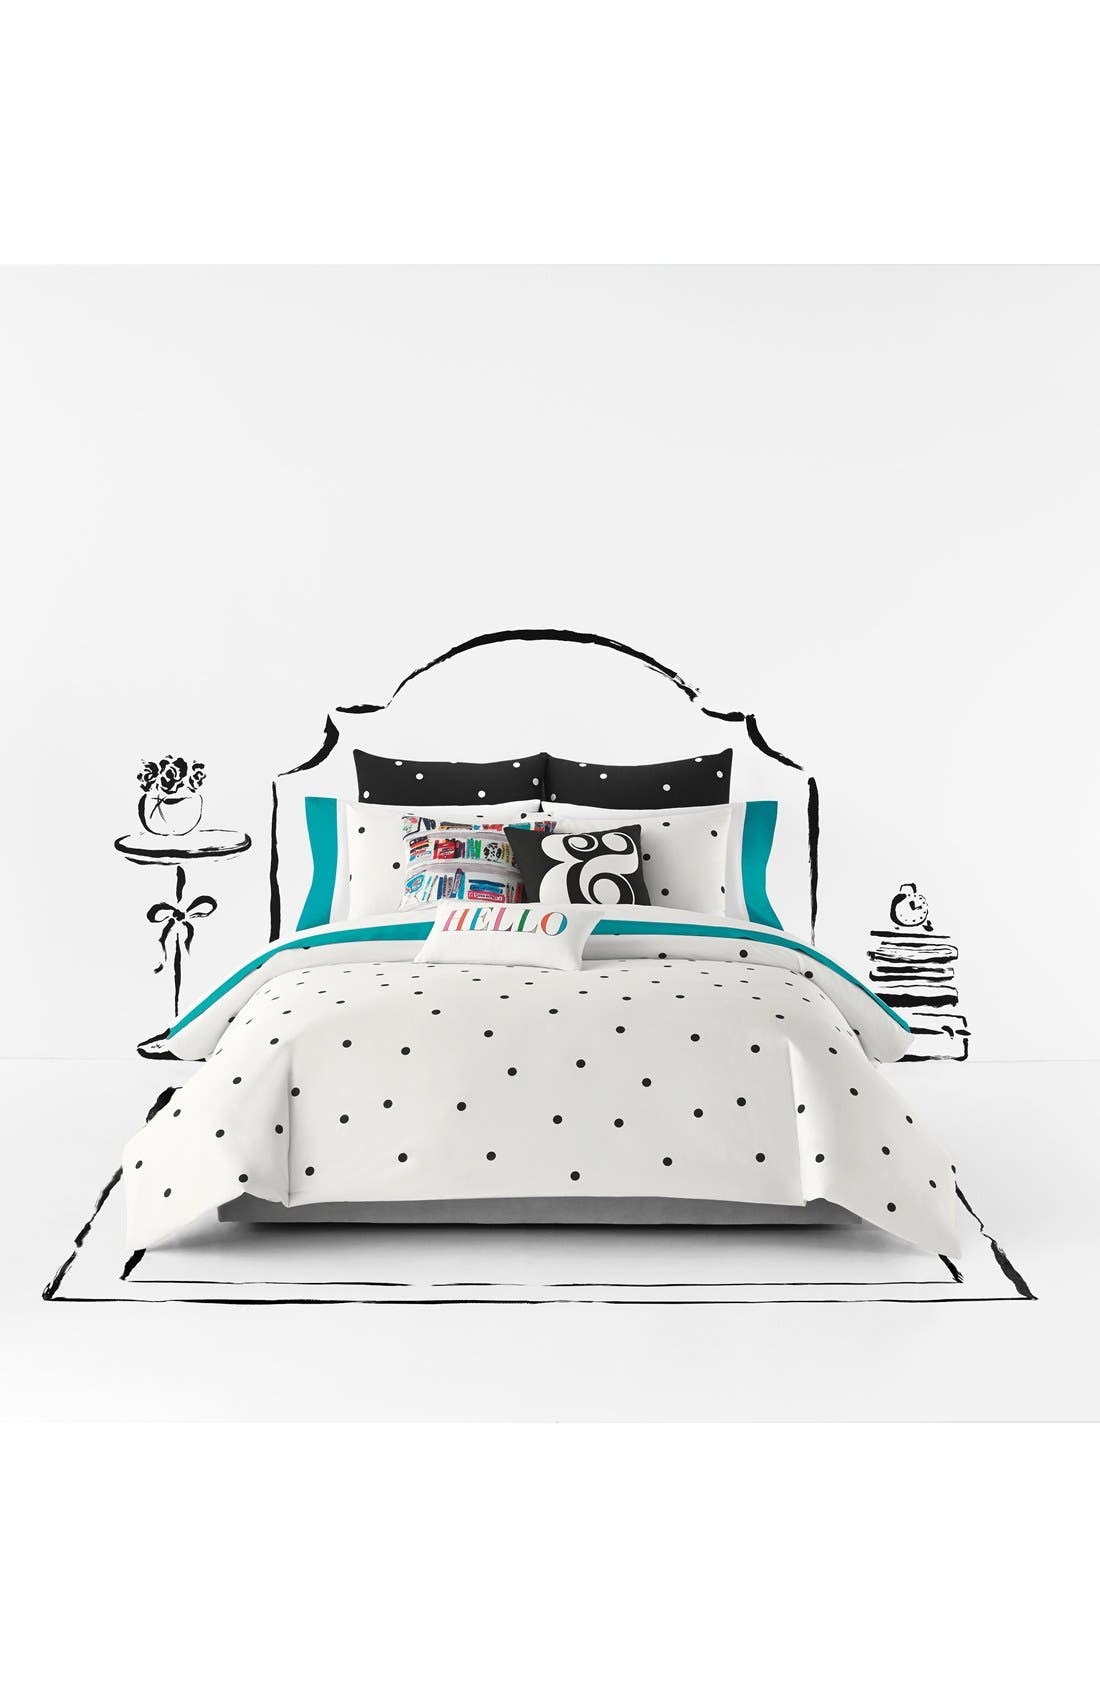 Kate Spade Bedding Kate Spade New York Bedding Comforters Nordstrom